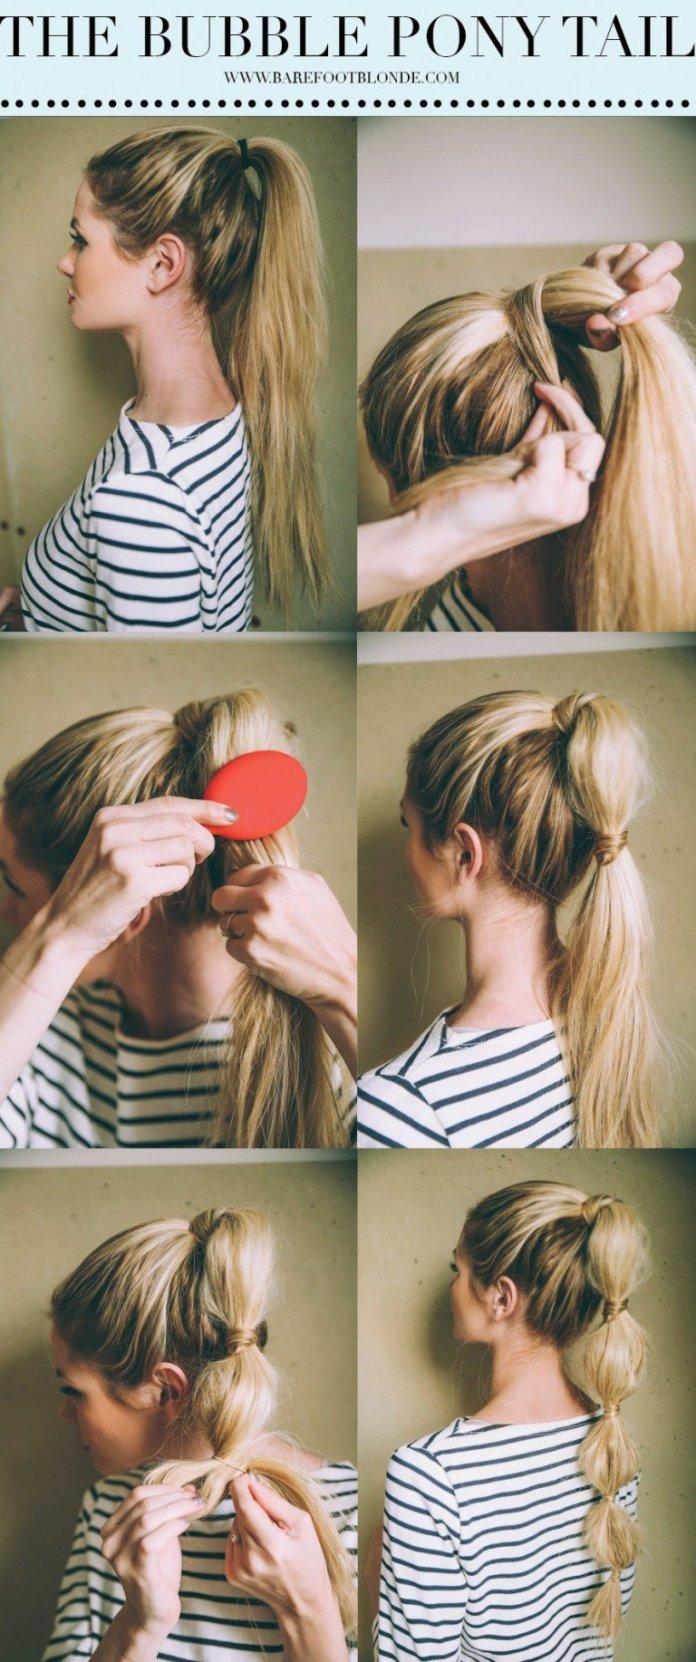 Bubble pony tail hair tutorial